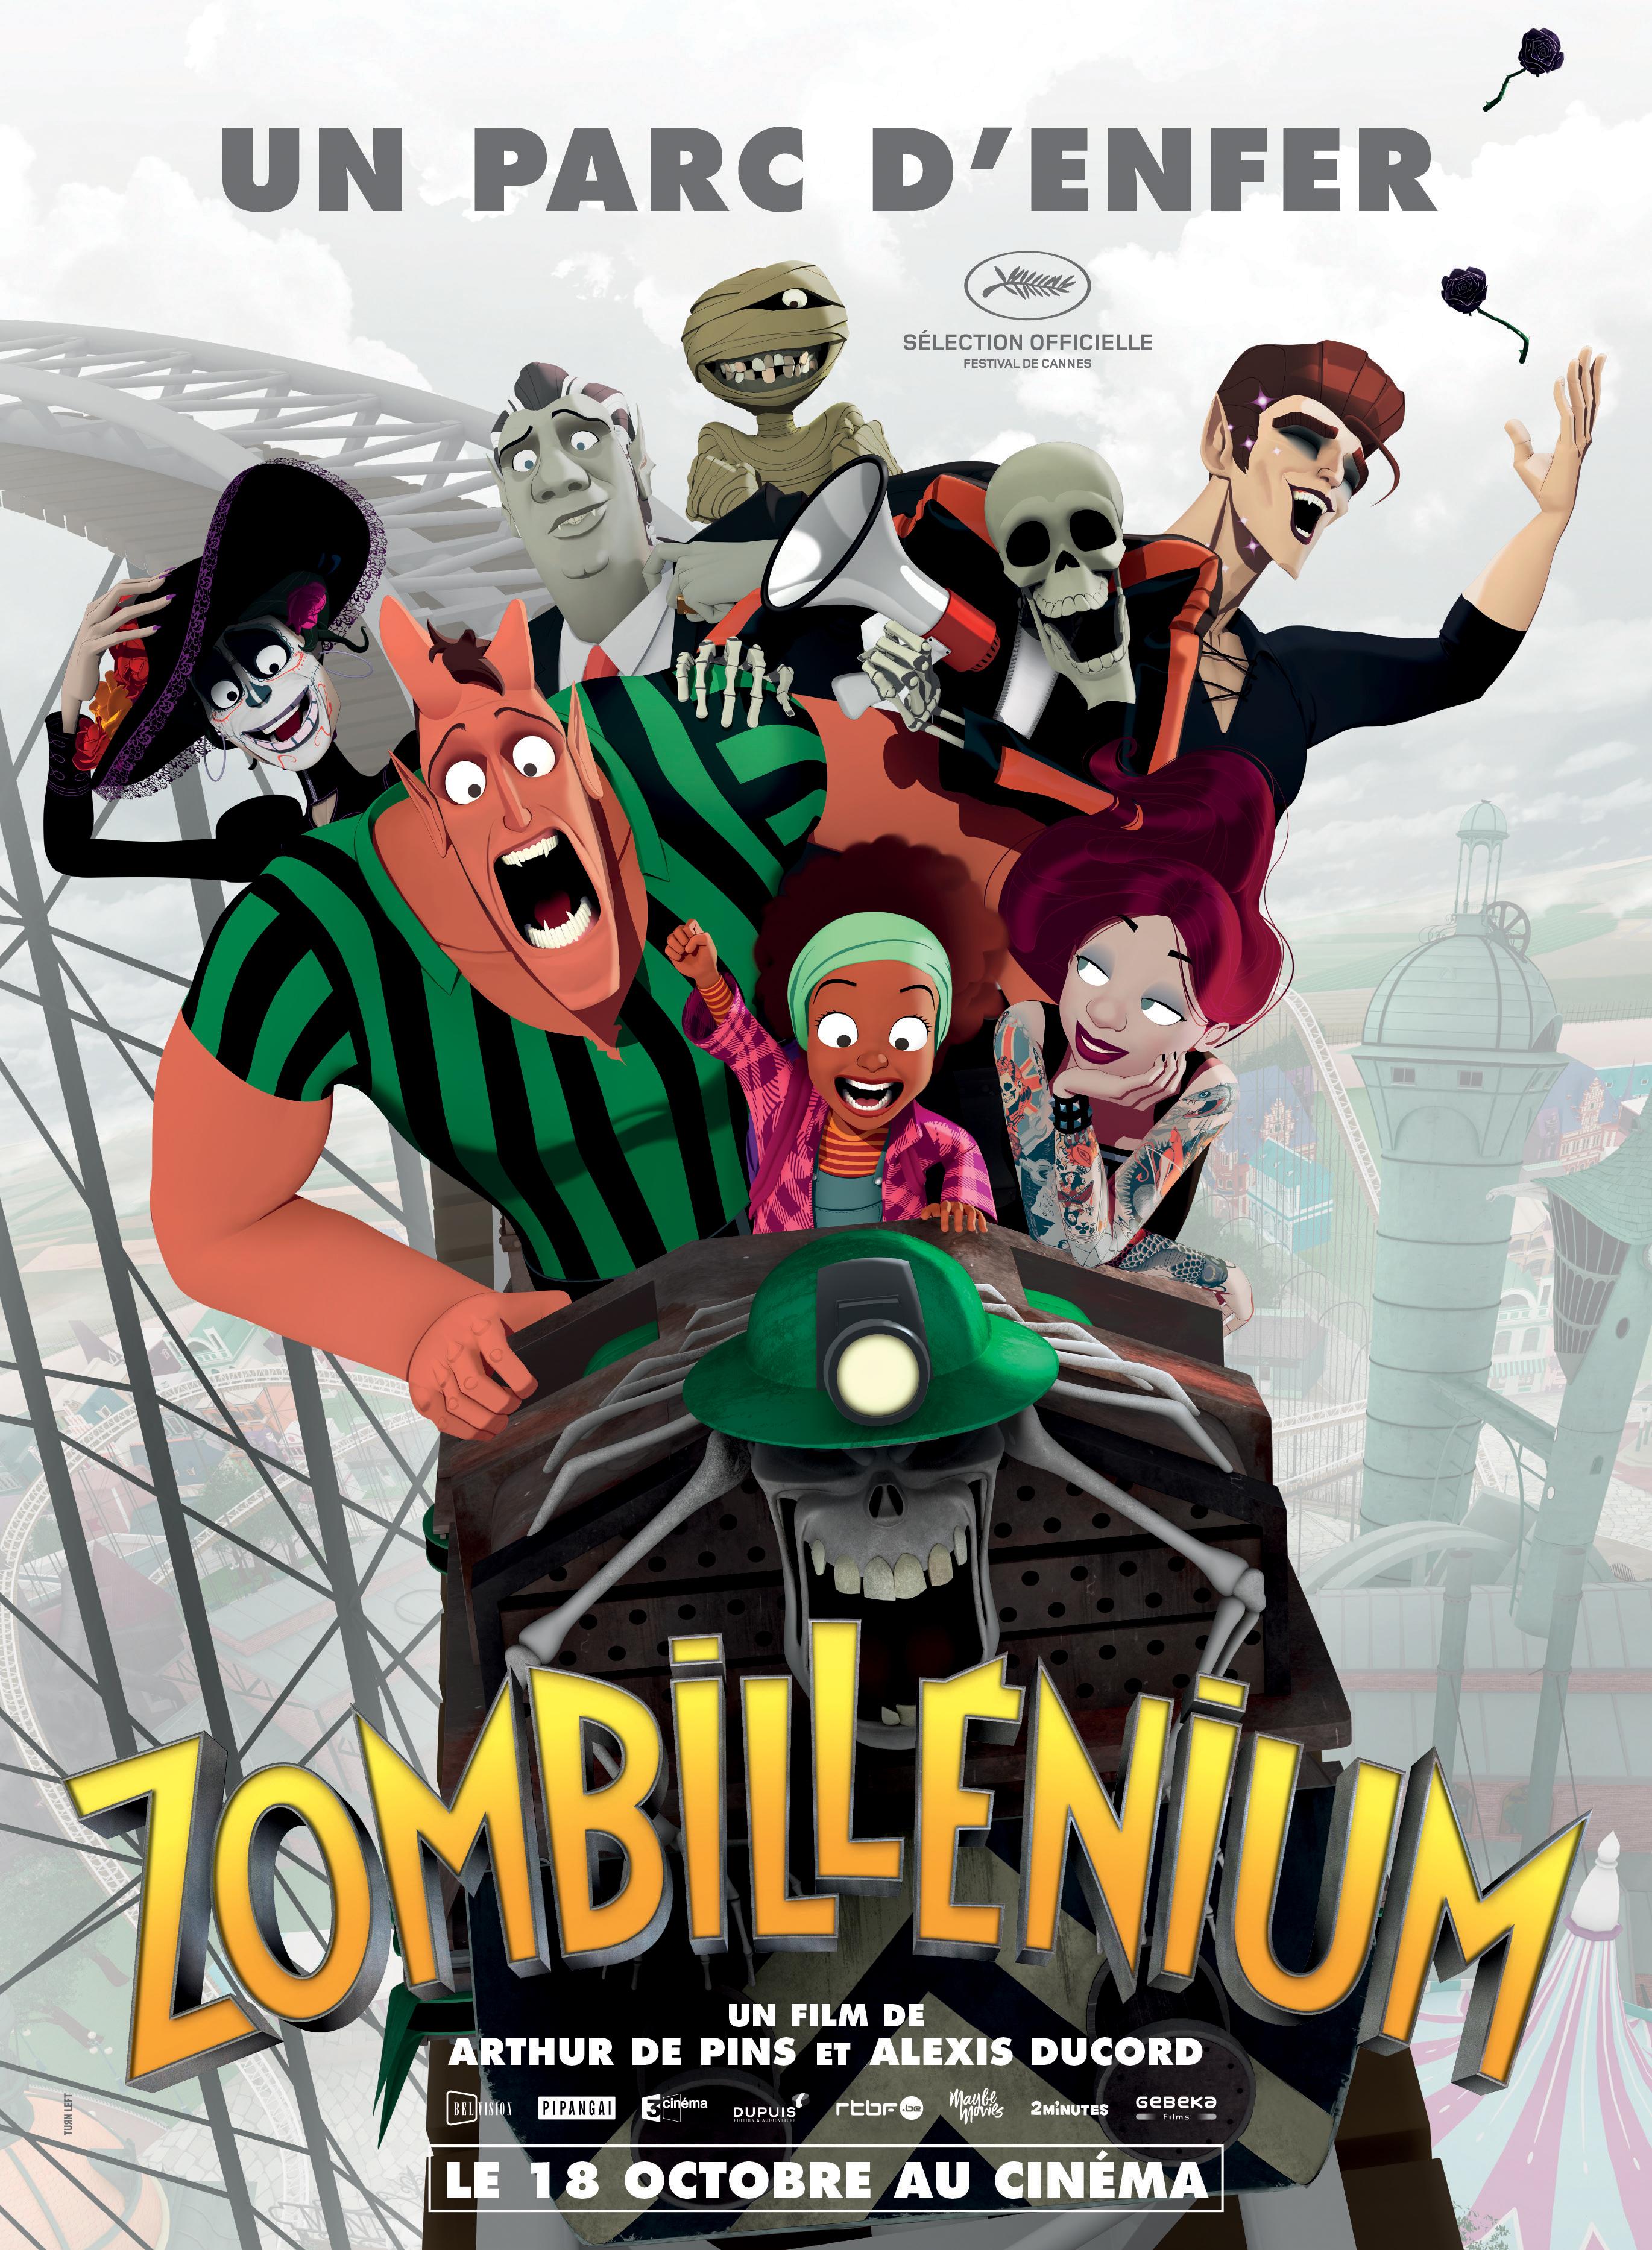 Zombileniumas (2017) / Zombillenium